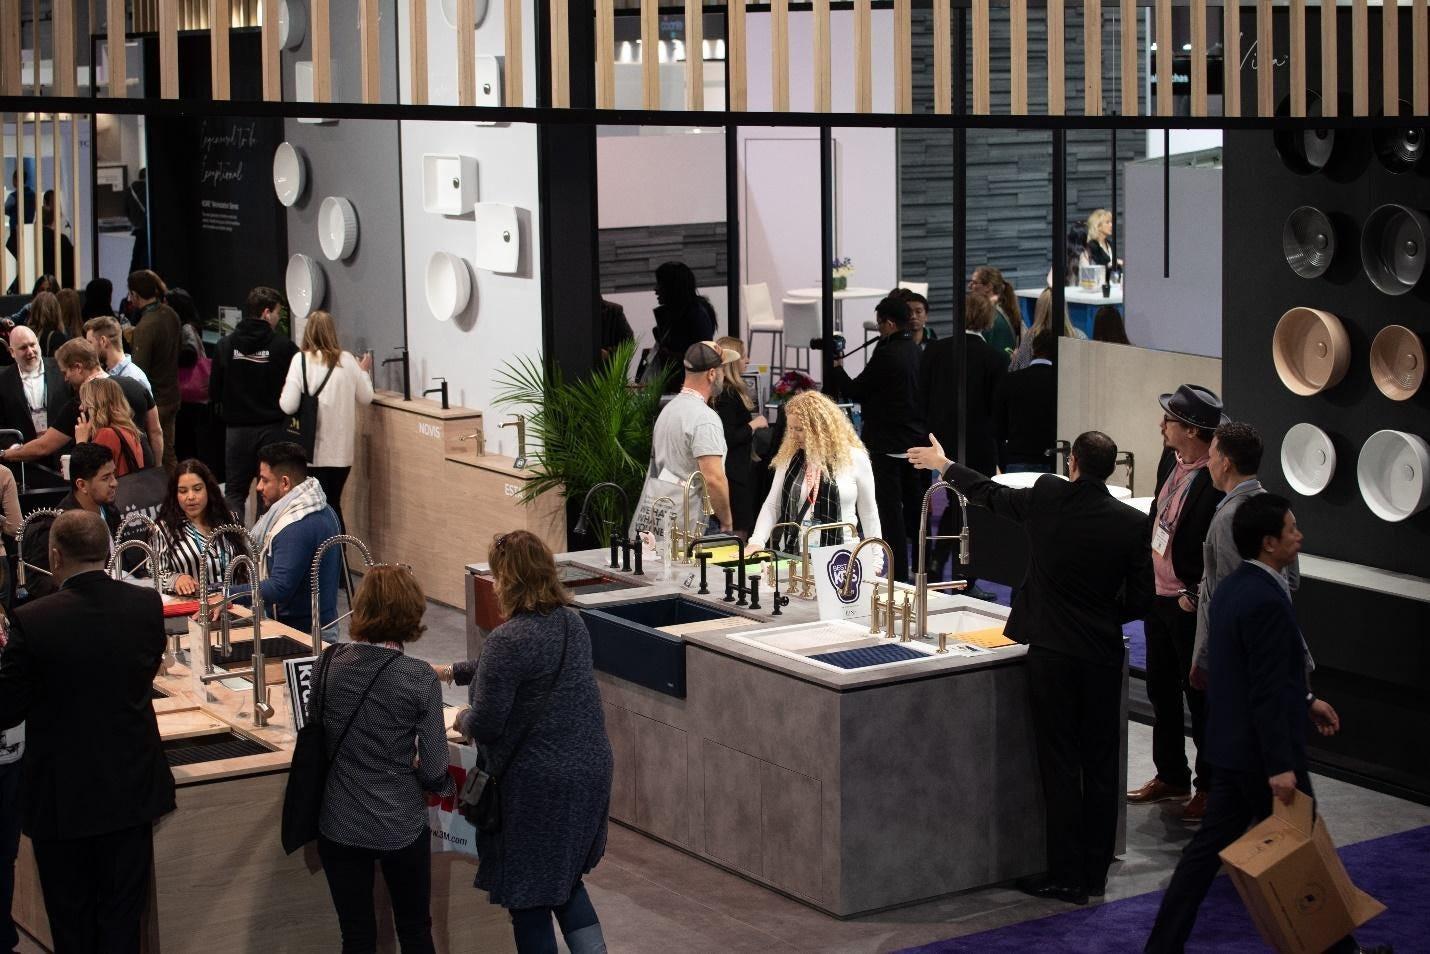 kraus-kbis-2020-displays-and-visitors